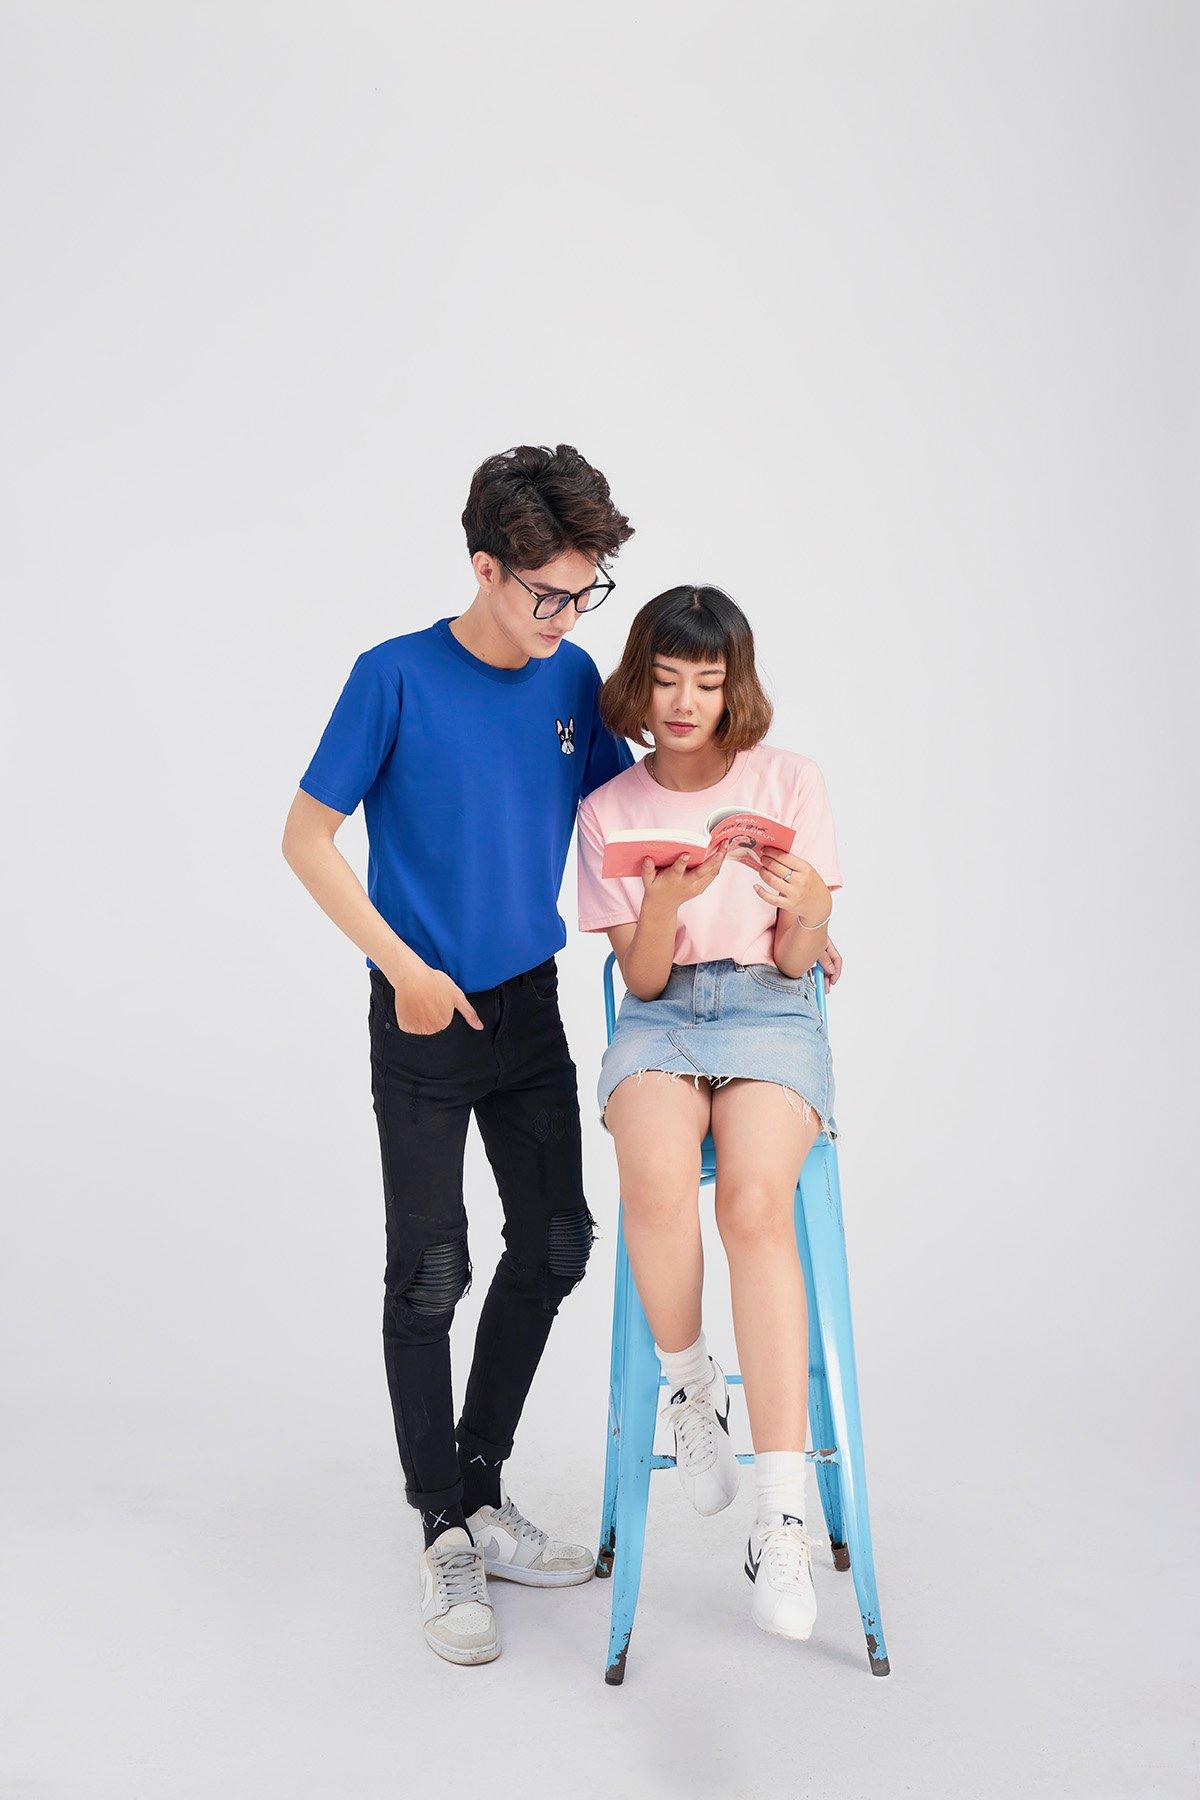 Say Happy Tshirt - Áo thun xanh đậm form medium thêu